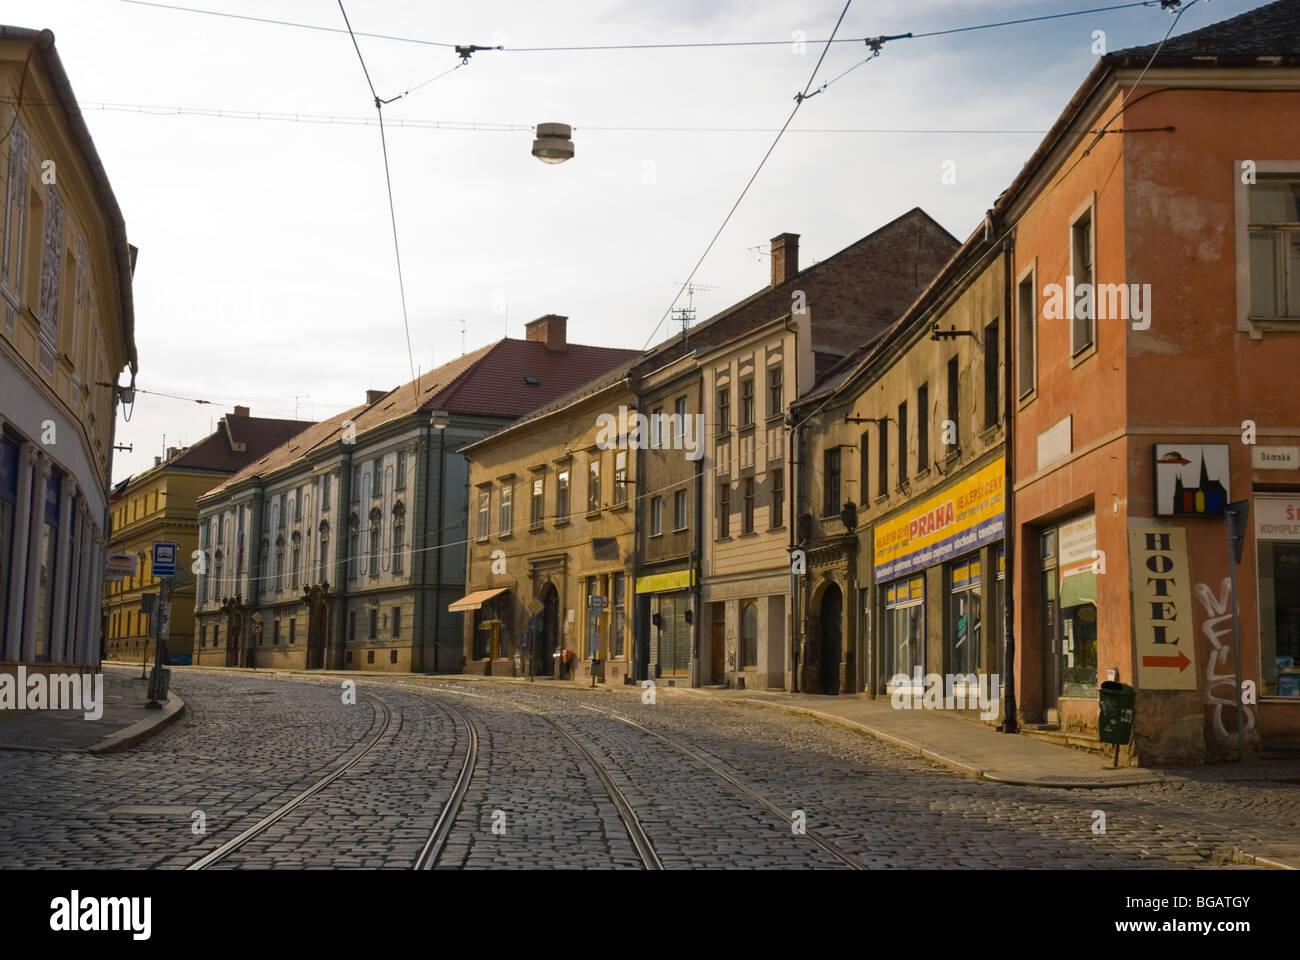 Street central Olomouc Czech Republic Europe - Stock Image